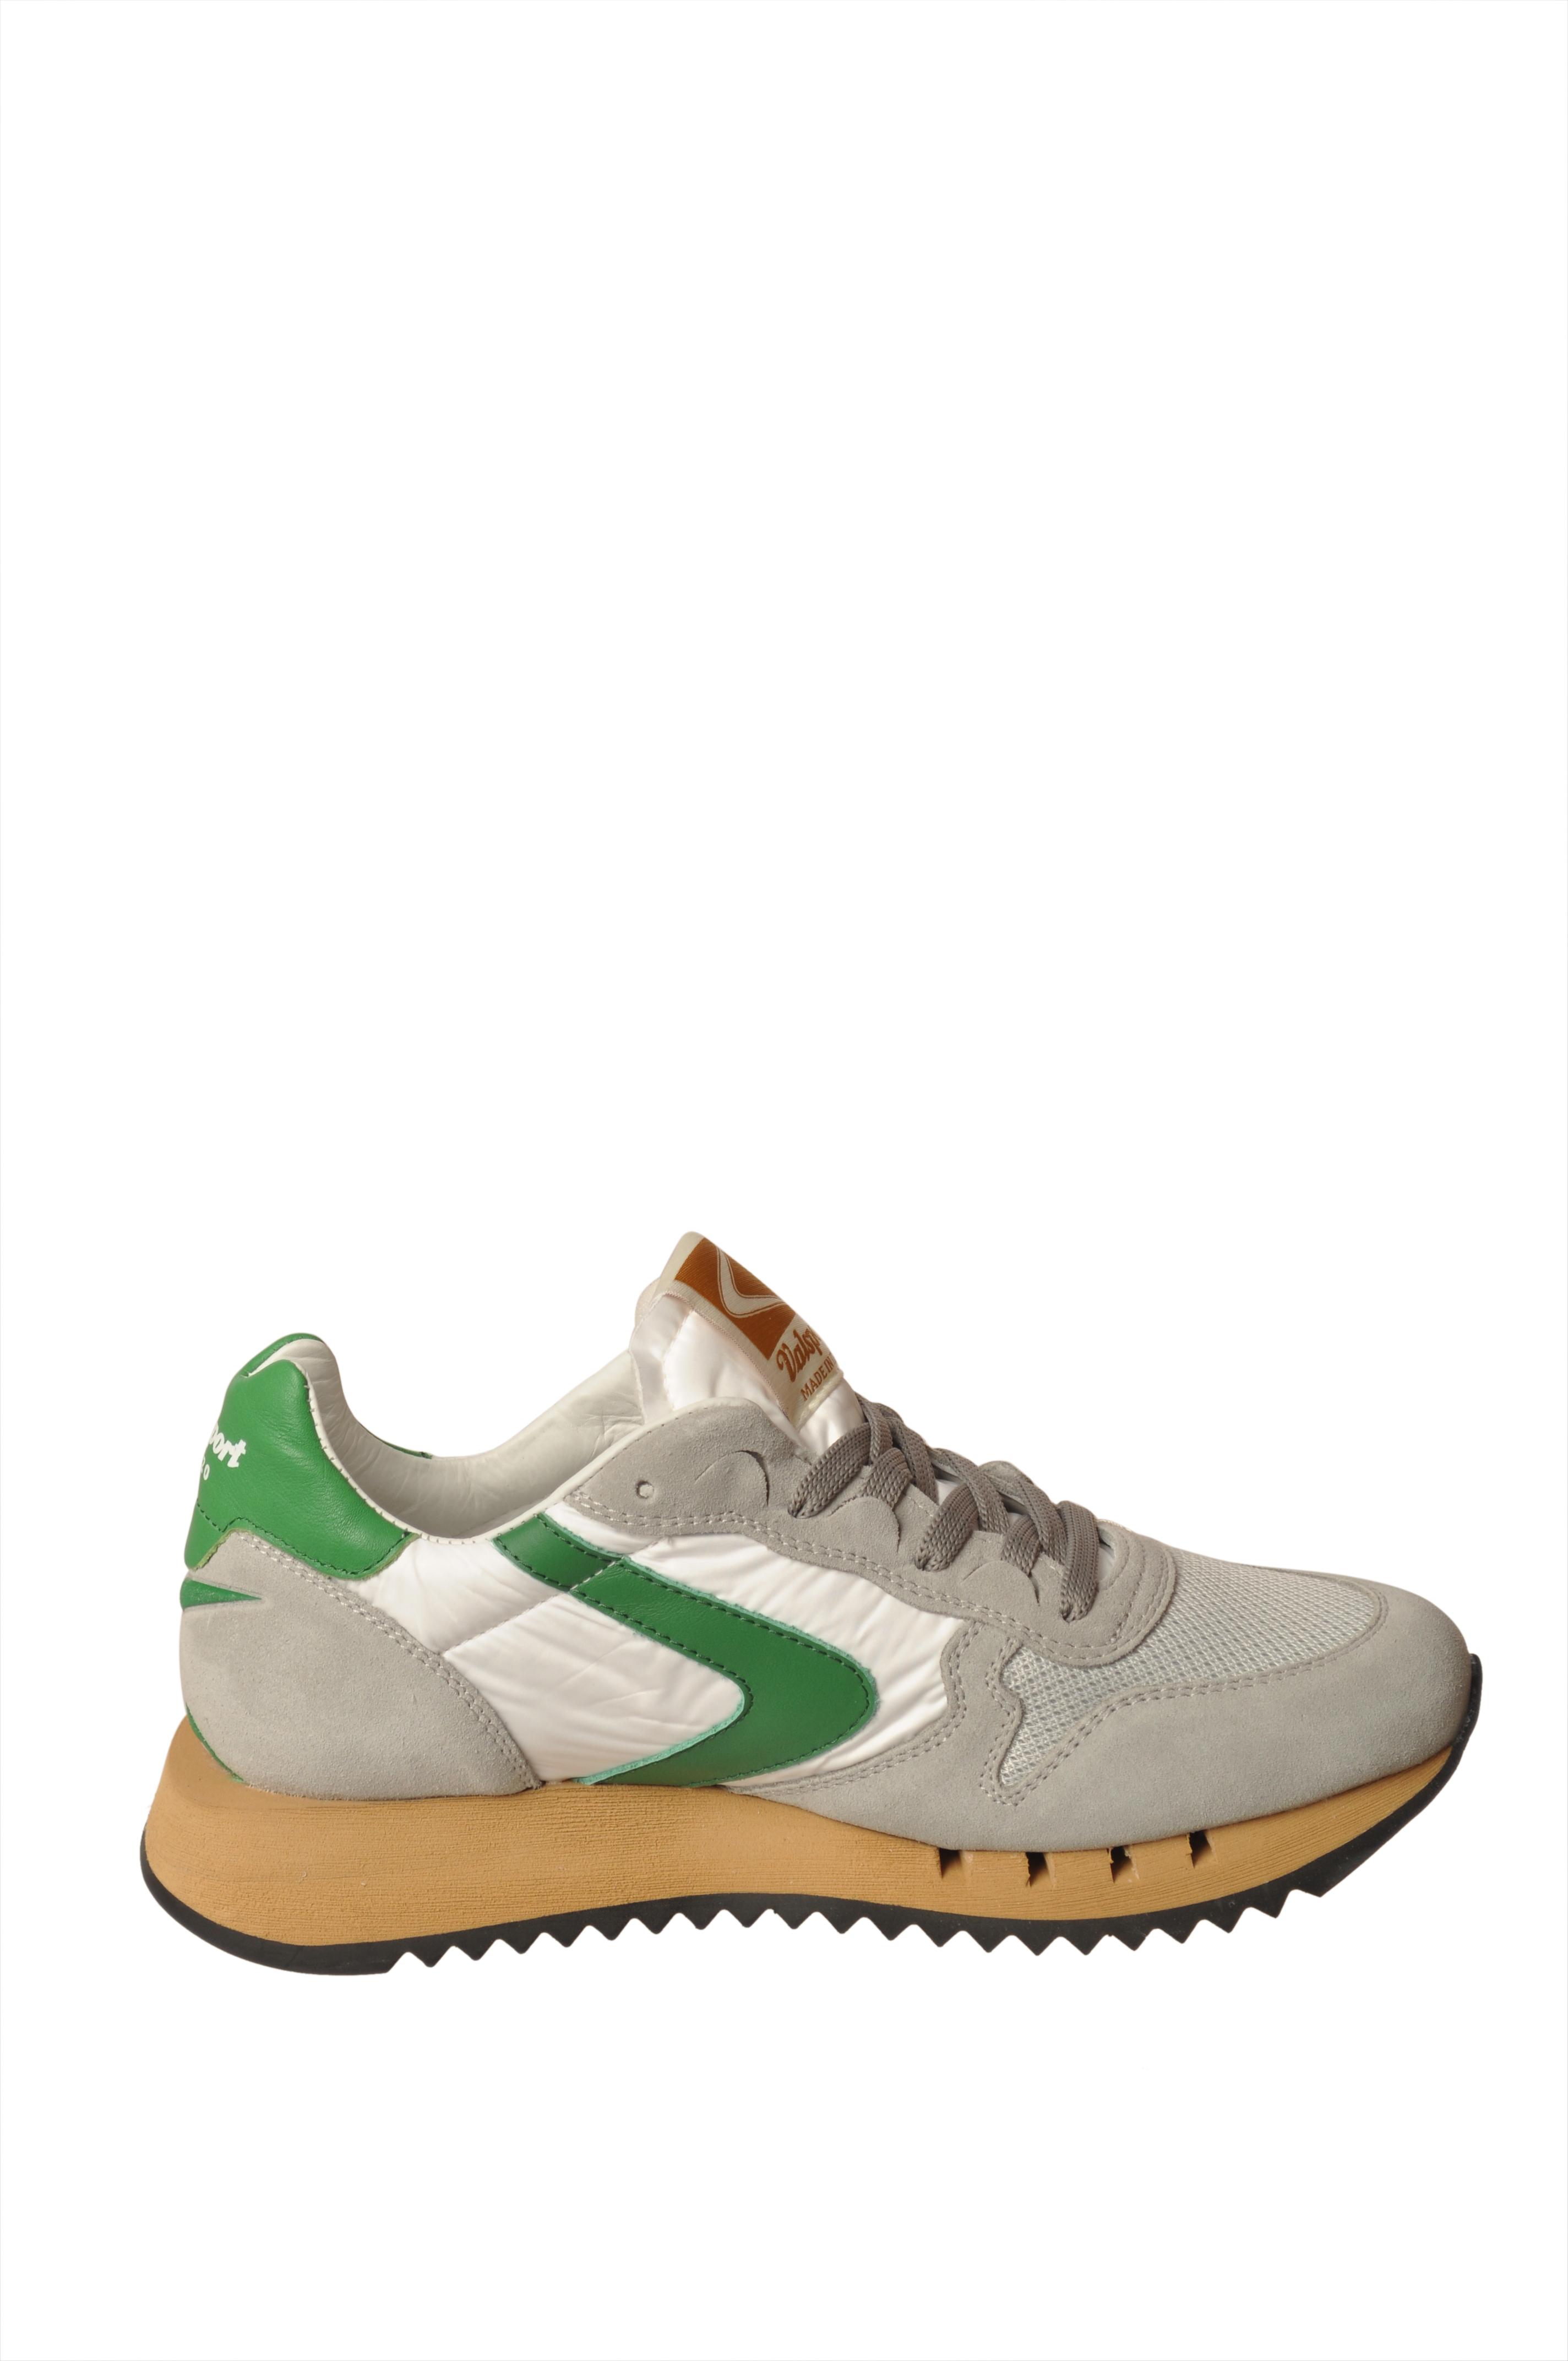 "VALSPORT ""MAGIC"" Sneakers"